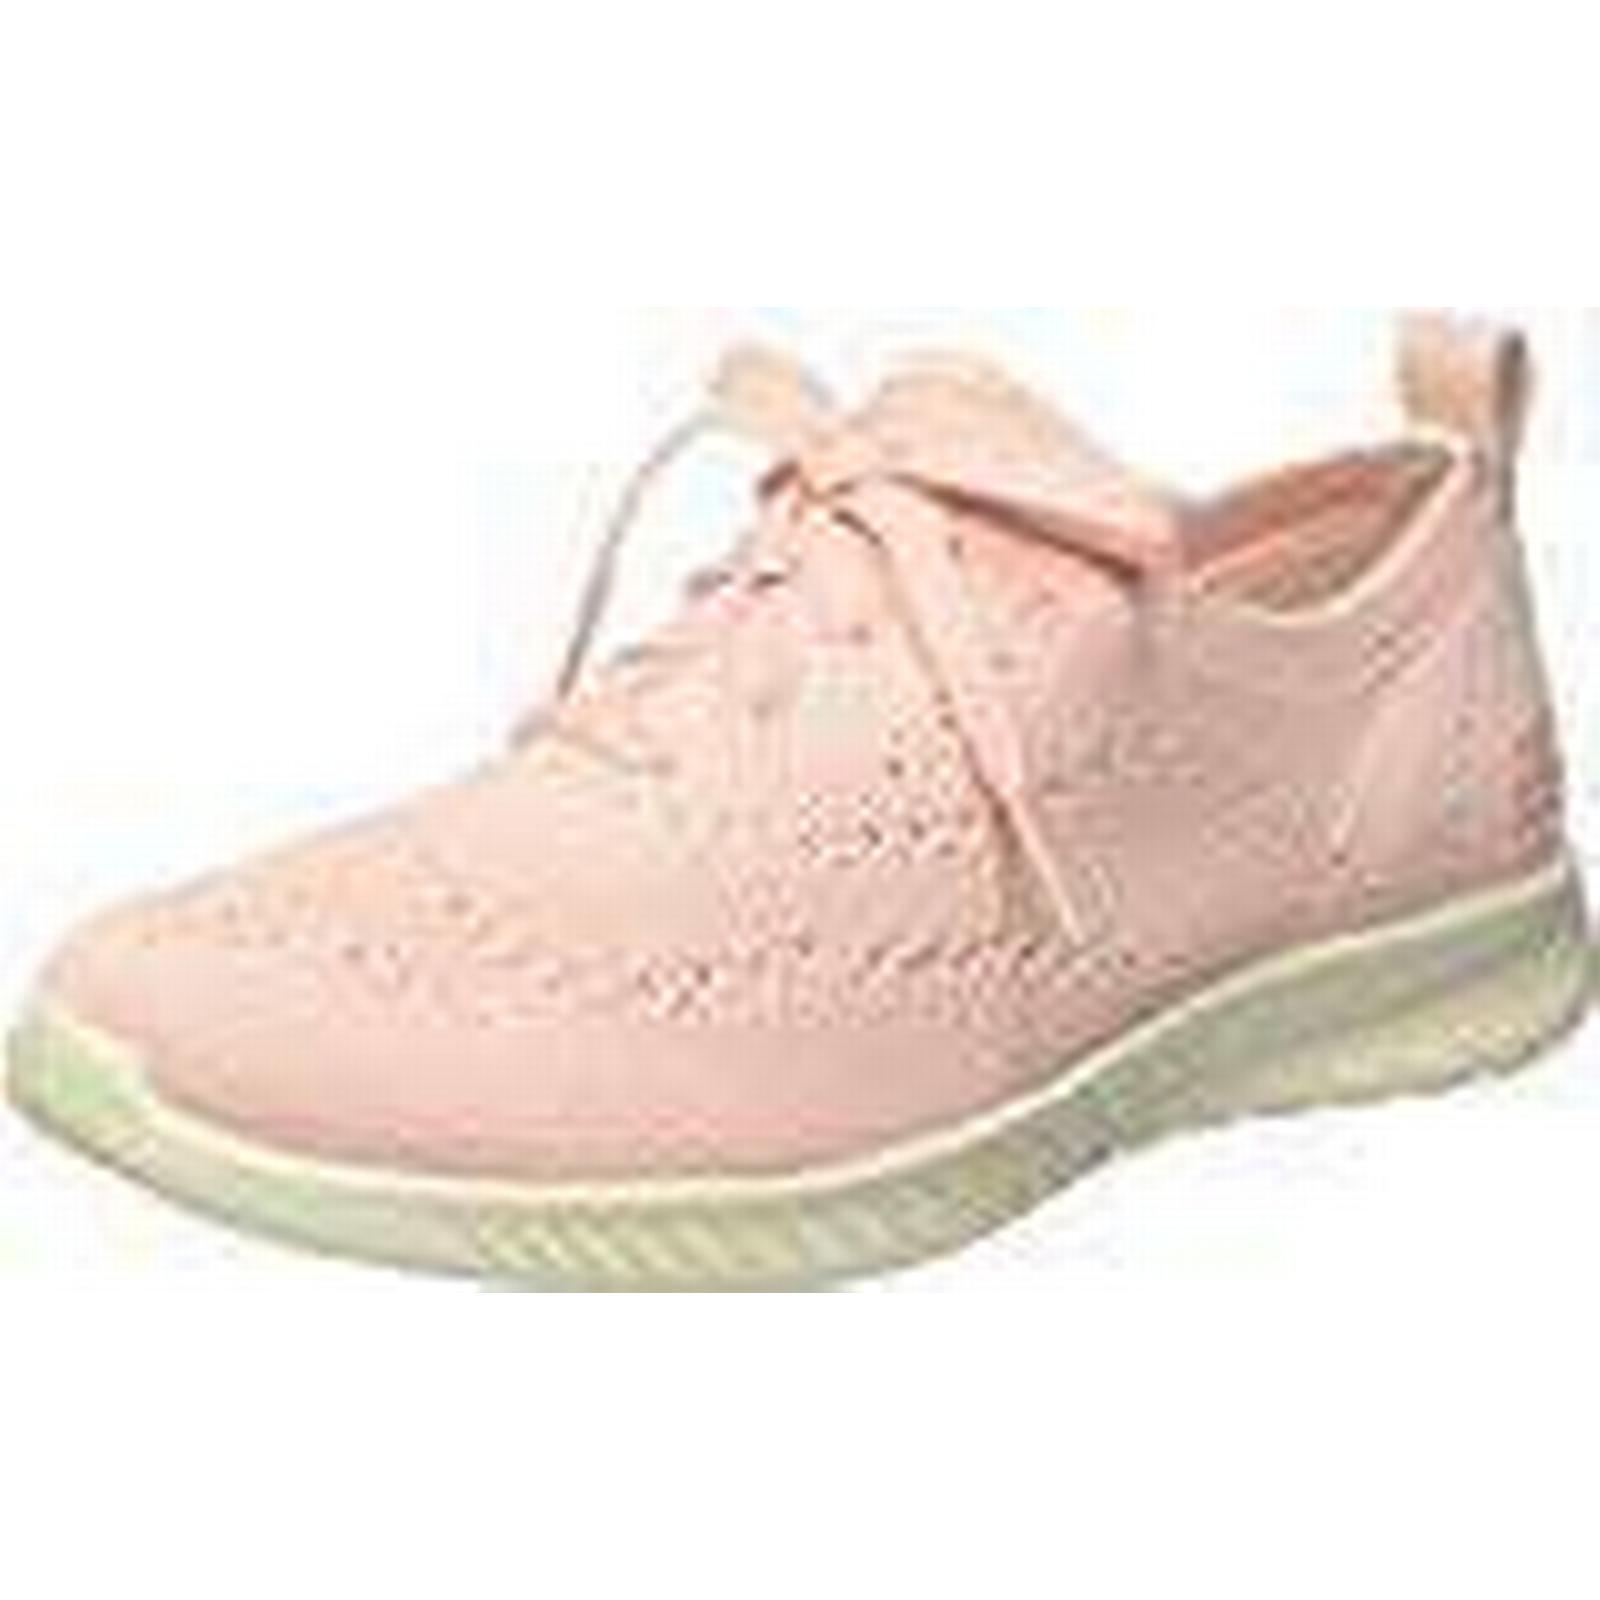 Skechers Women's 23630 Trainers, (Light EU Pink), 4 UK 37 EU (Light f09015